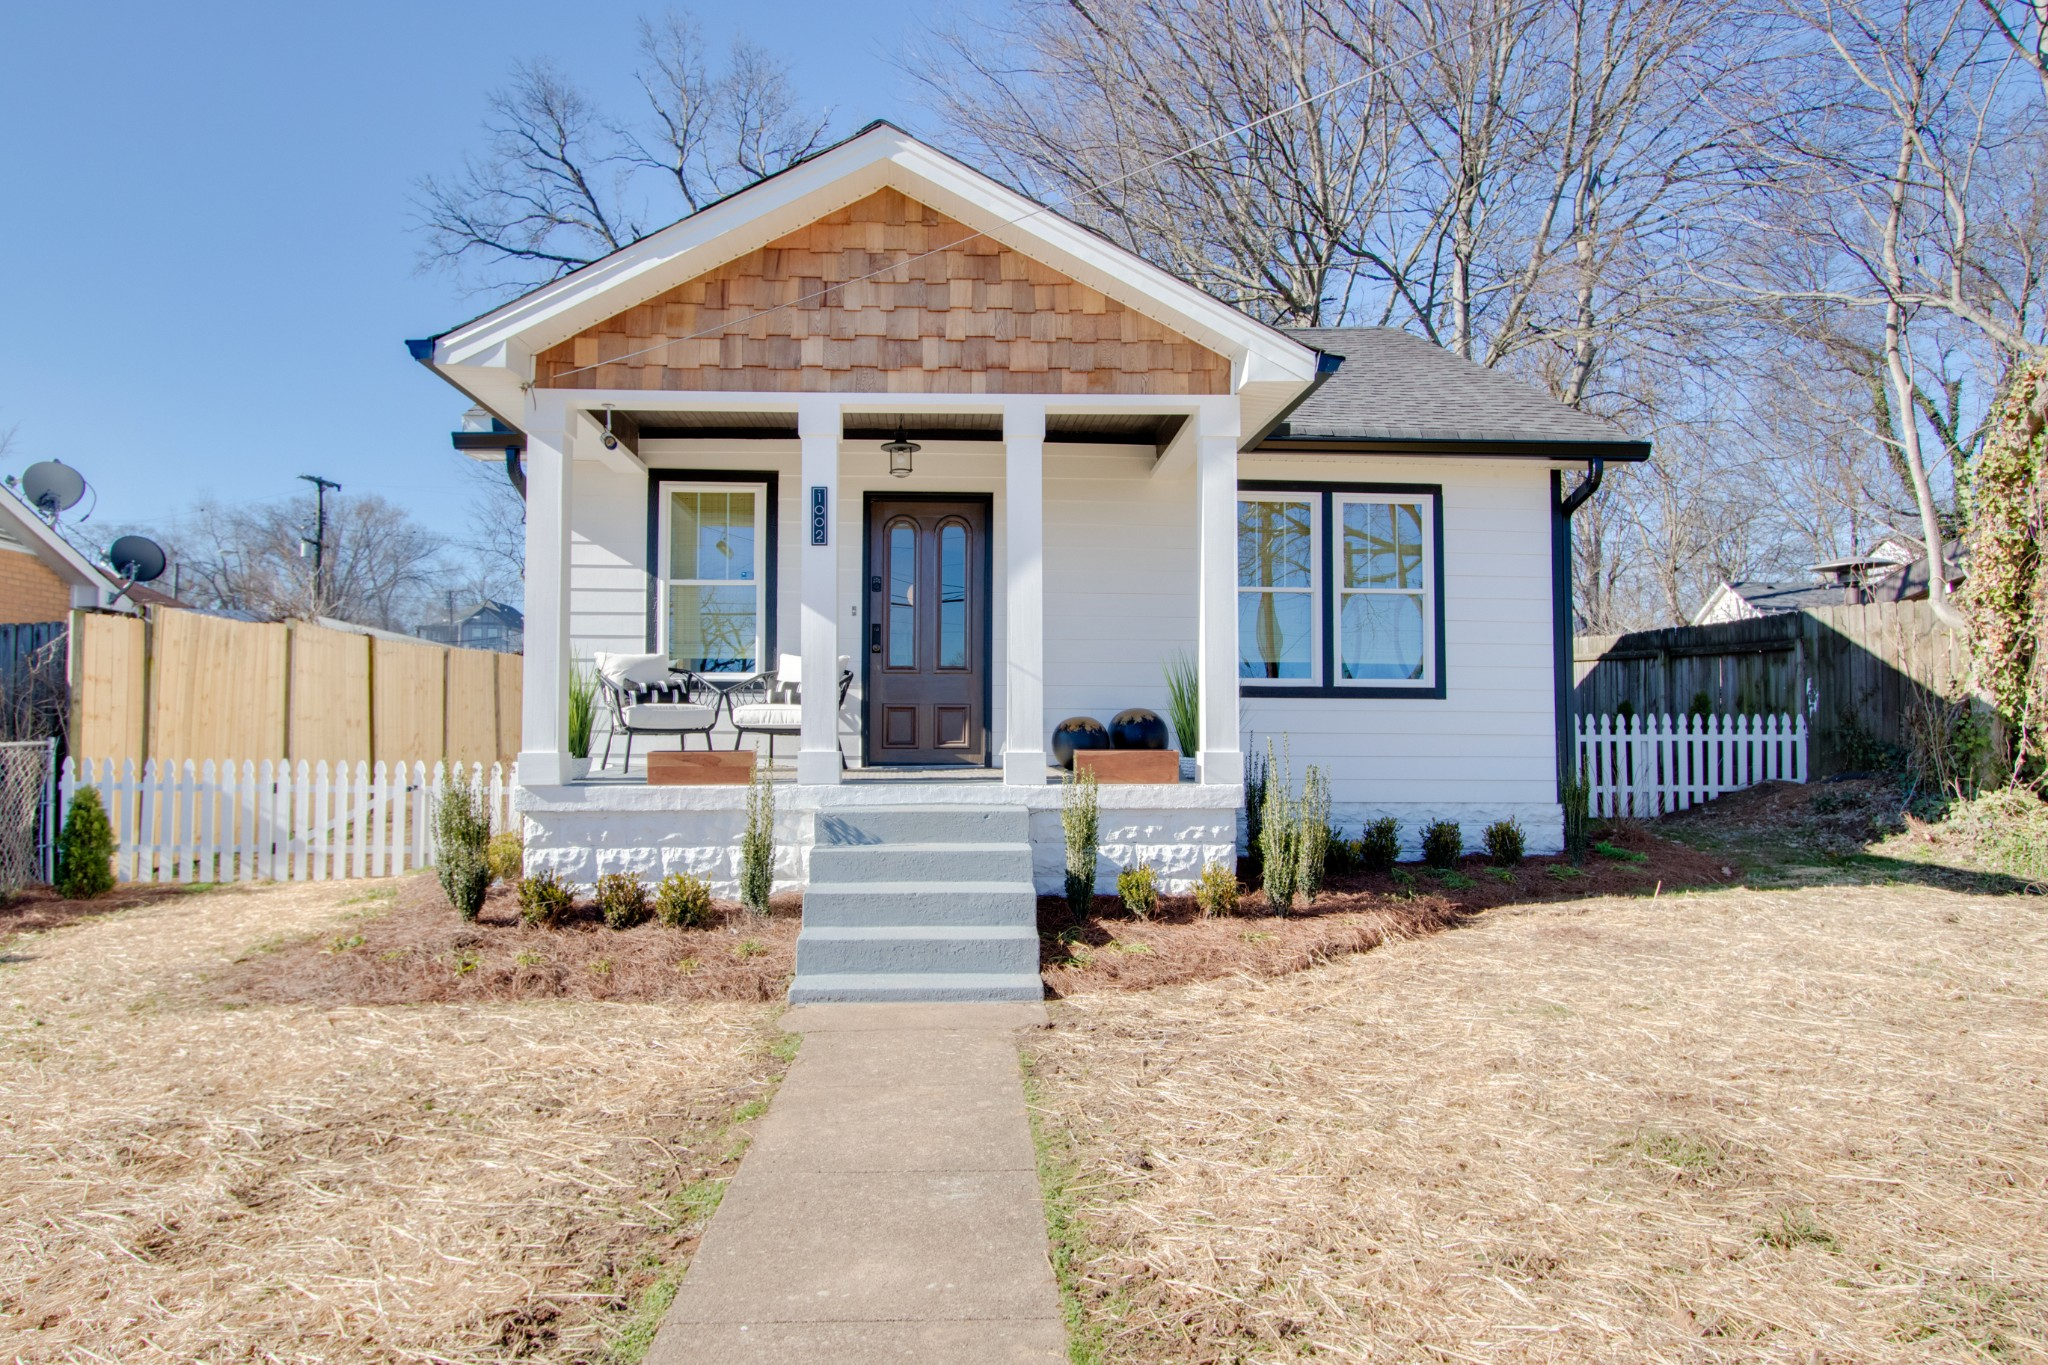 1002 N 7th St, Nashville, TN 37207 - Nashville, TN real estate listing